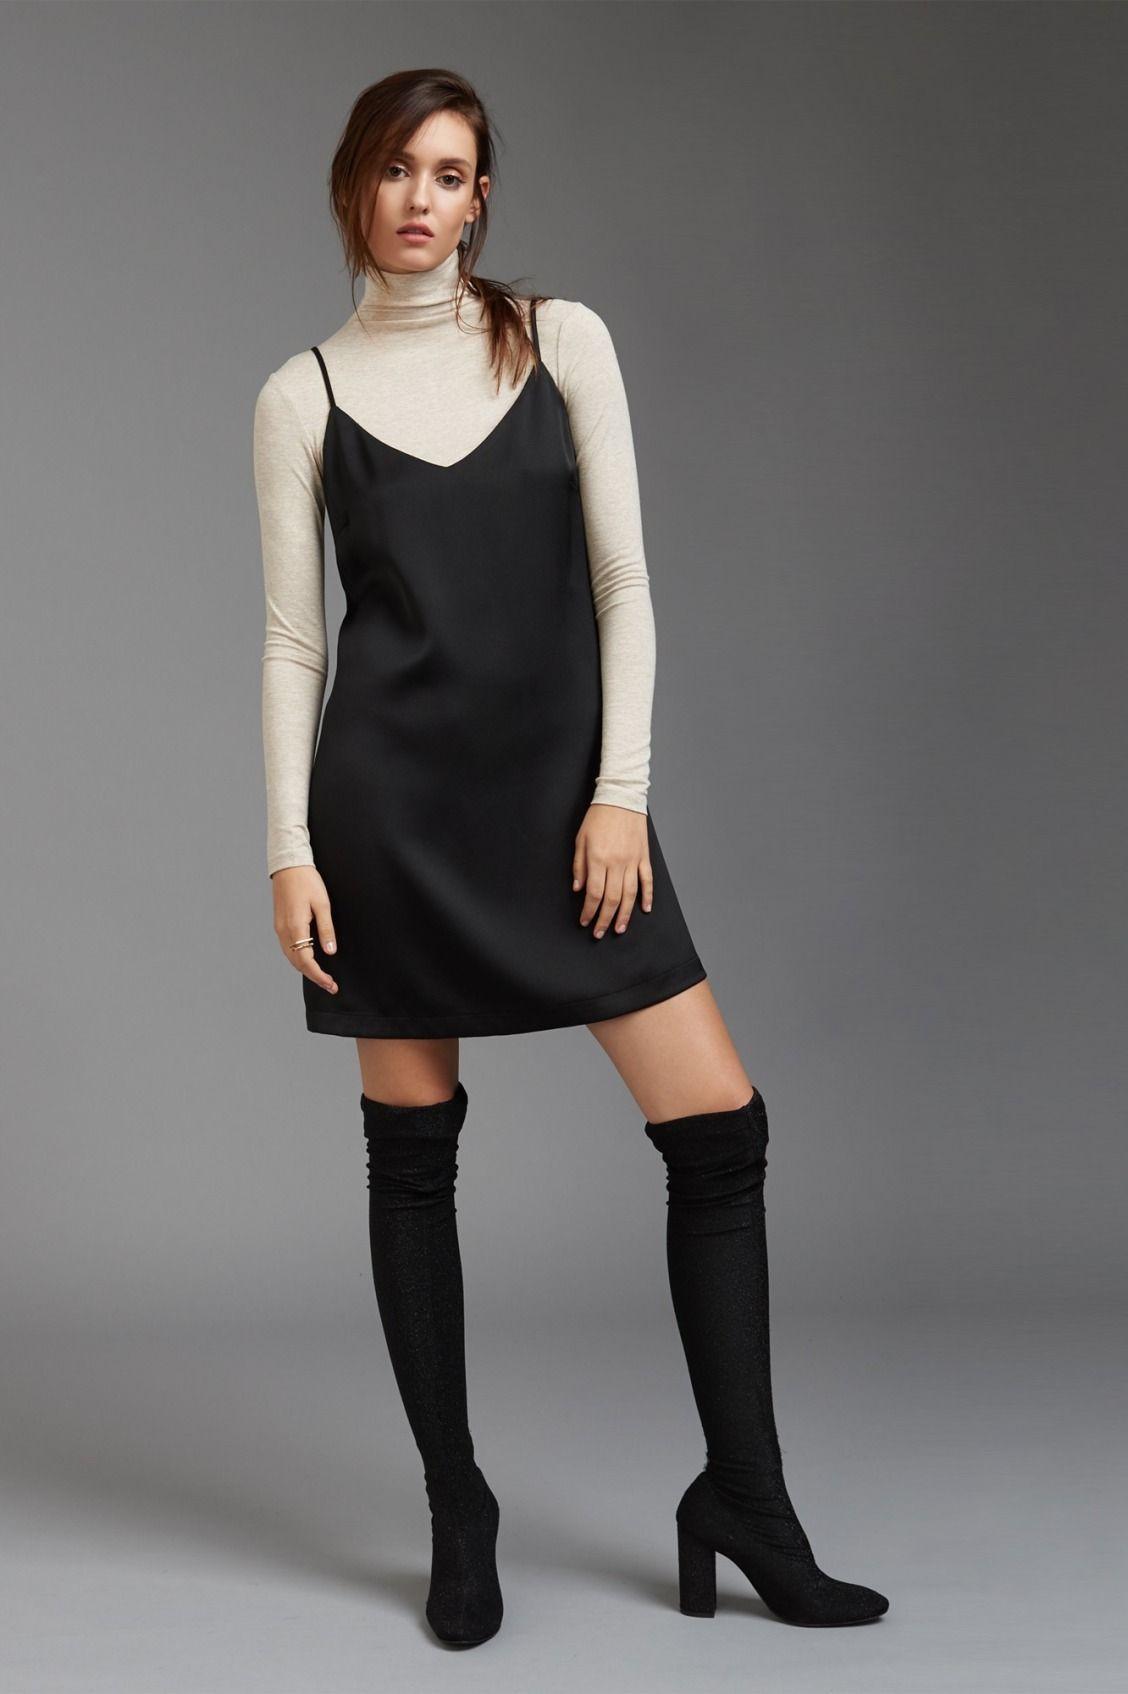 Pin By Grace Catherine On Fashion Dress Over Turtleneck Fashion Slip Dress [ 1694 x 1128 Pixel ]